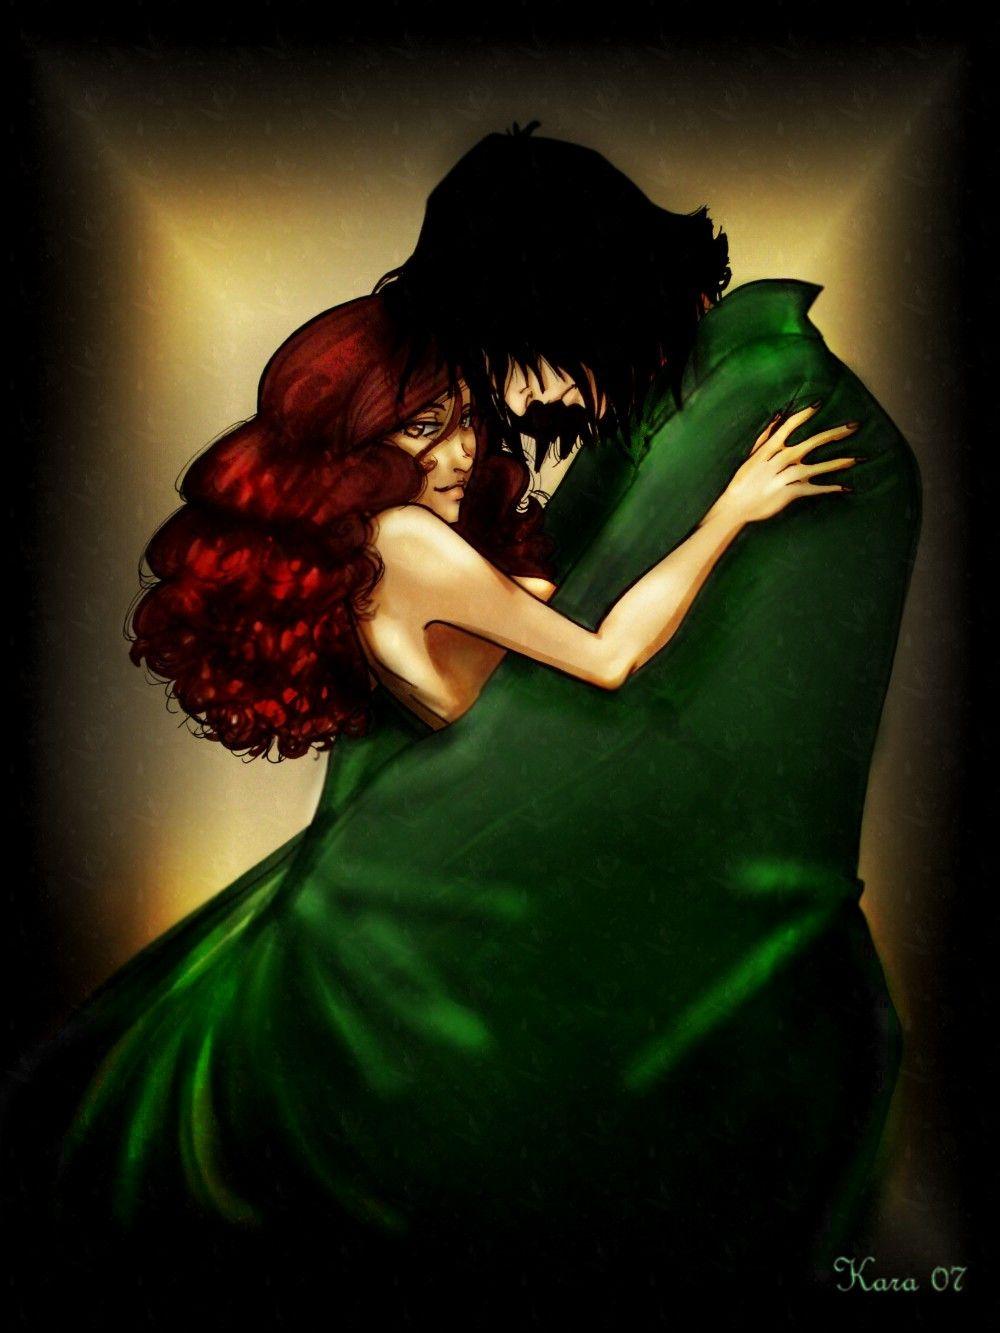 Protege Moi By Kara Lija Deviantart Com On Deviantart Hermione Granger Fanfiction Snape And Hermione Snape